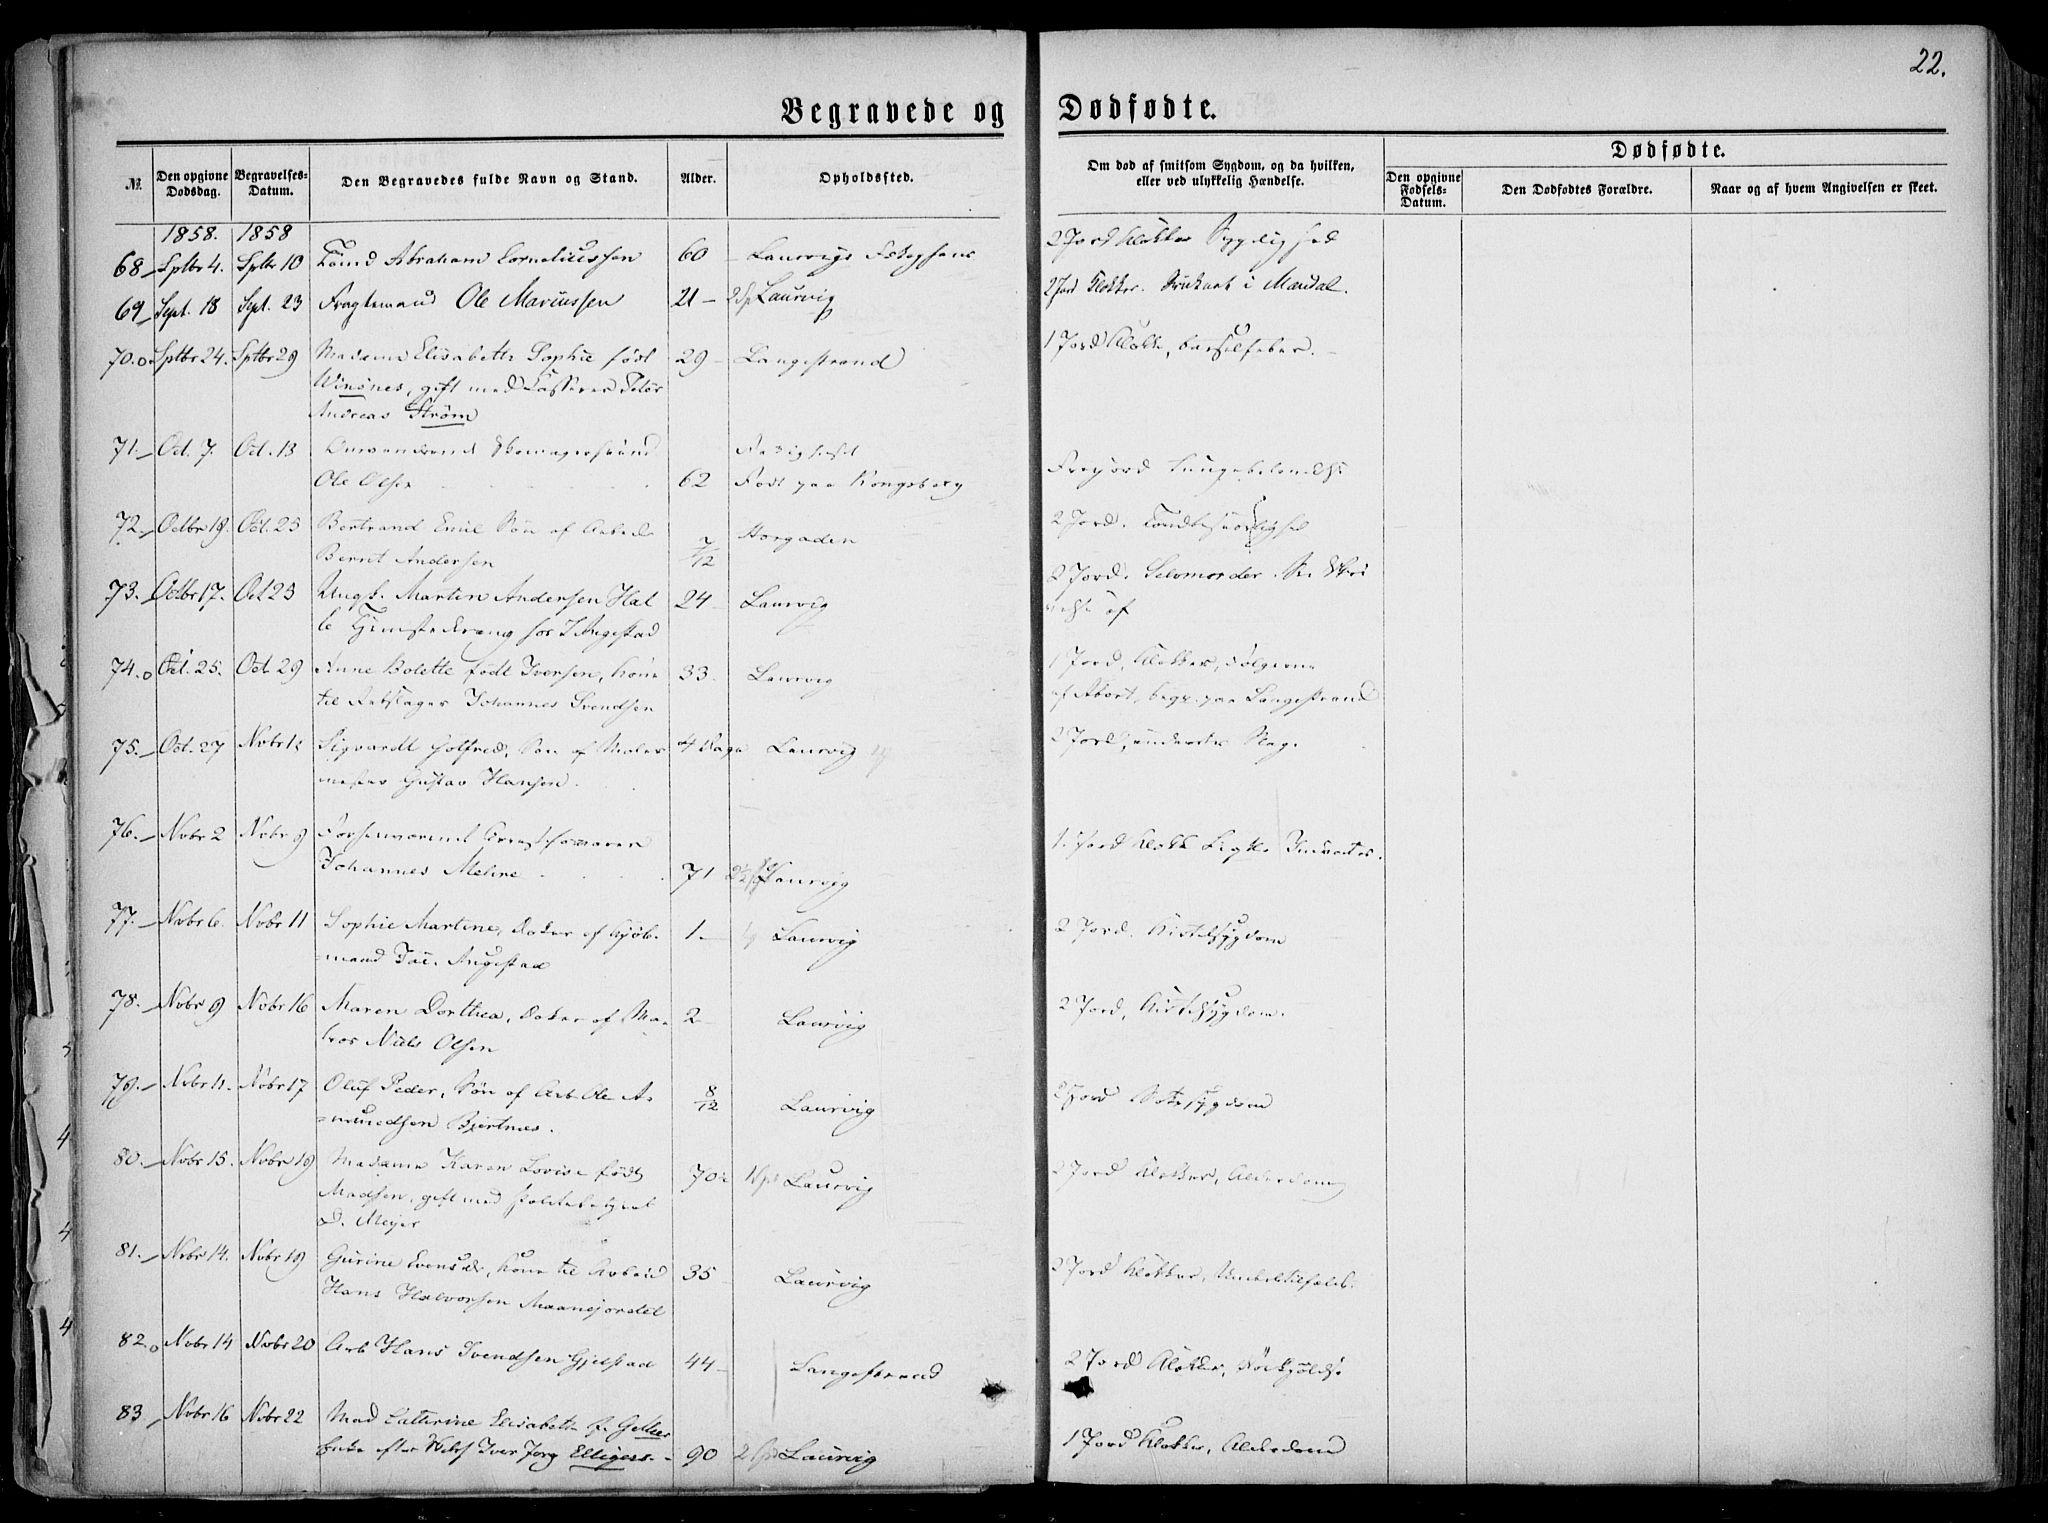 SAKO, Larvik kirkebøker, F/Fa/L0005: Ministerialbok nr. I 5, 1856-1870, s. 22